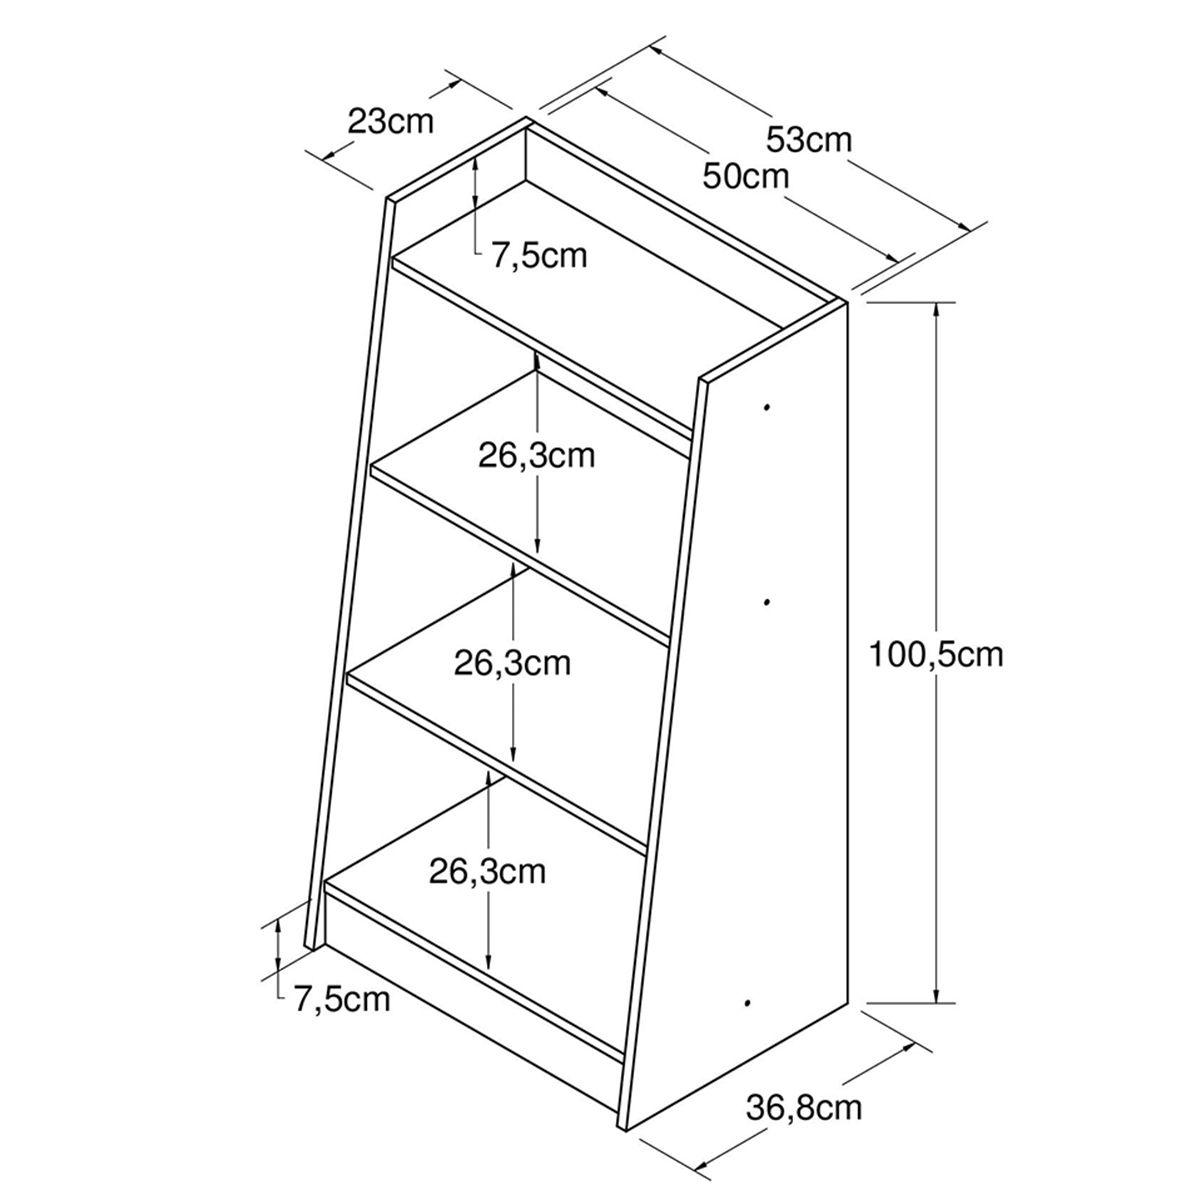 Quarto Infantil Completo Mini Cama Cômoda/Guarda Roupa 1 Mesa 2 Cadeiras Estantes Multiuso 3 Prateleiras Nicho Montana - Art In Móveis